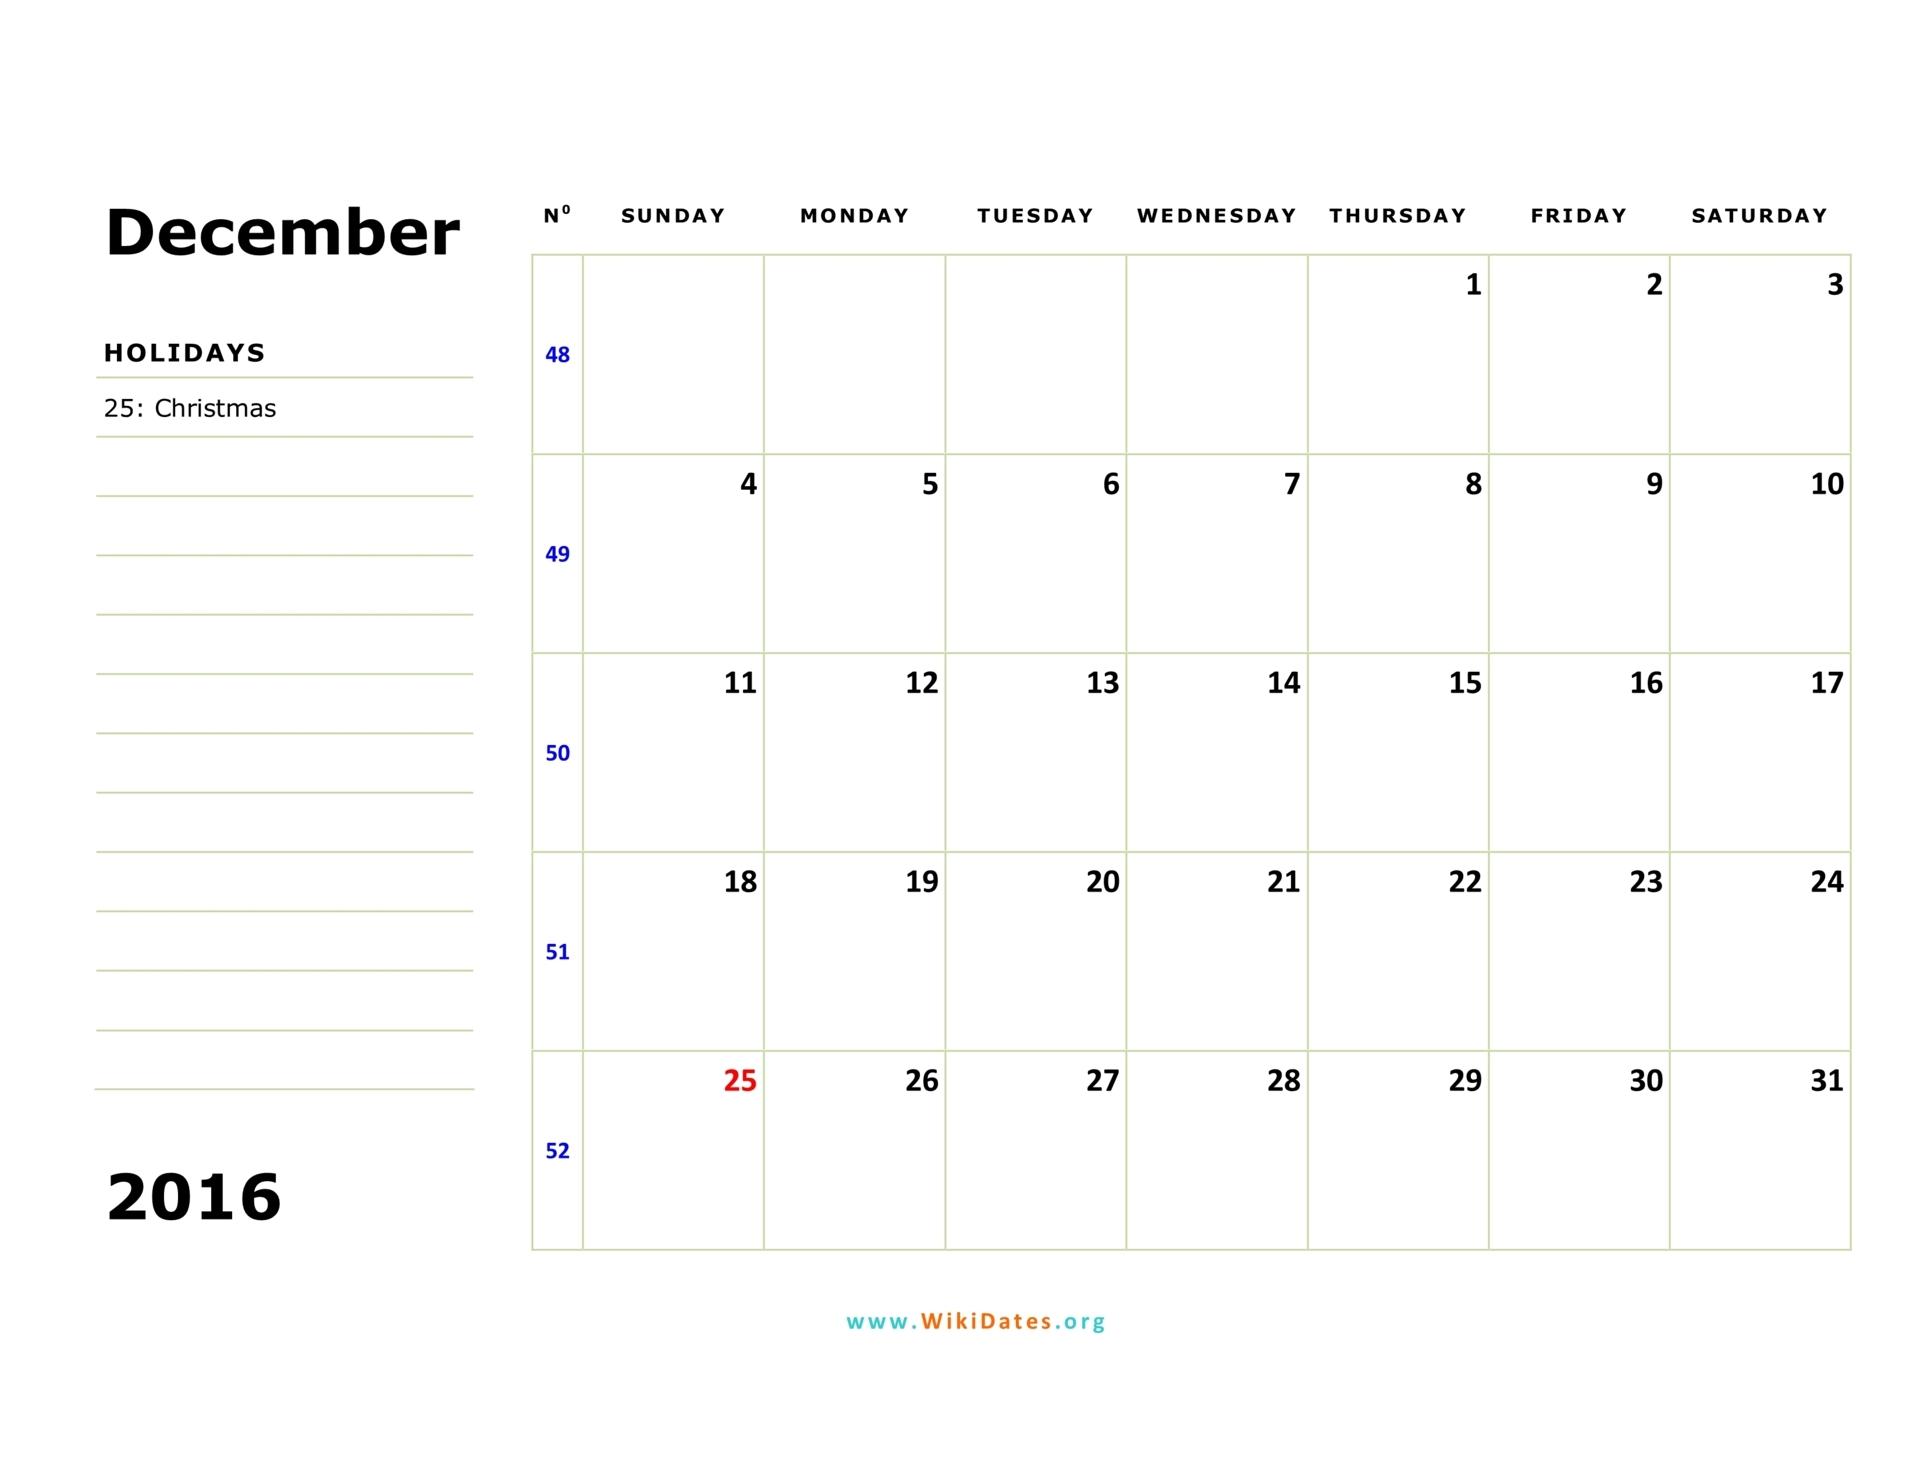 December Calendar 2016 Printable With Holidays